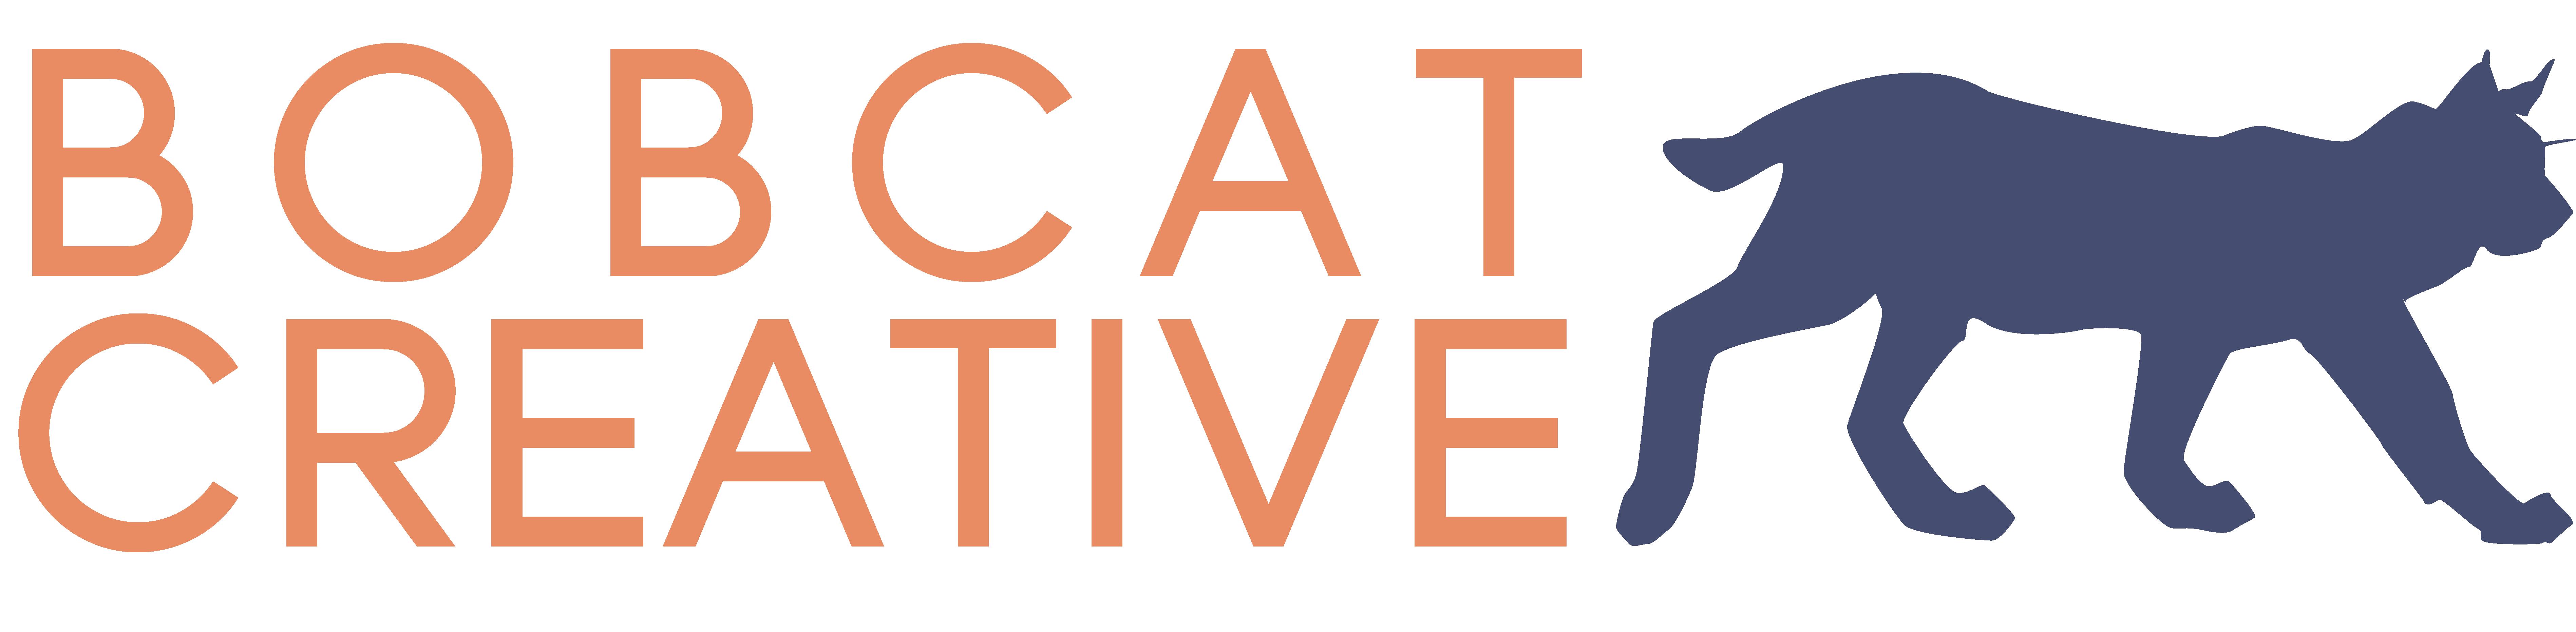 Bobcat Creative